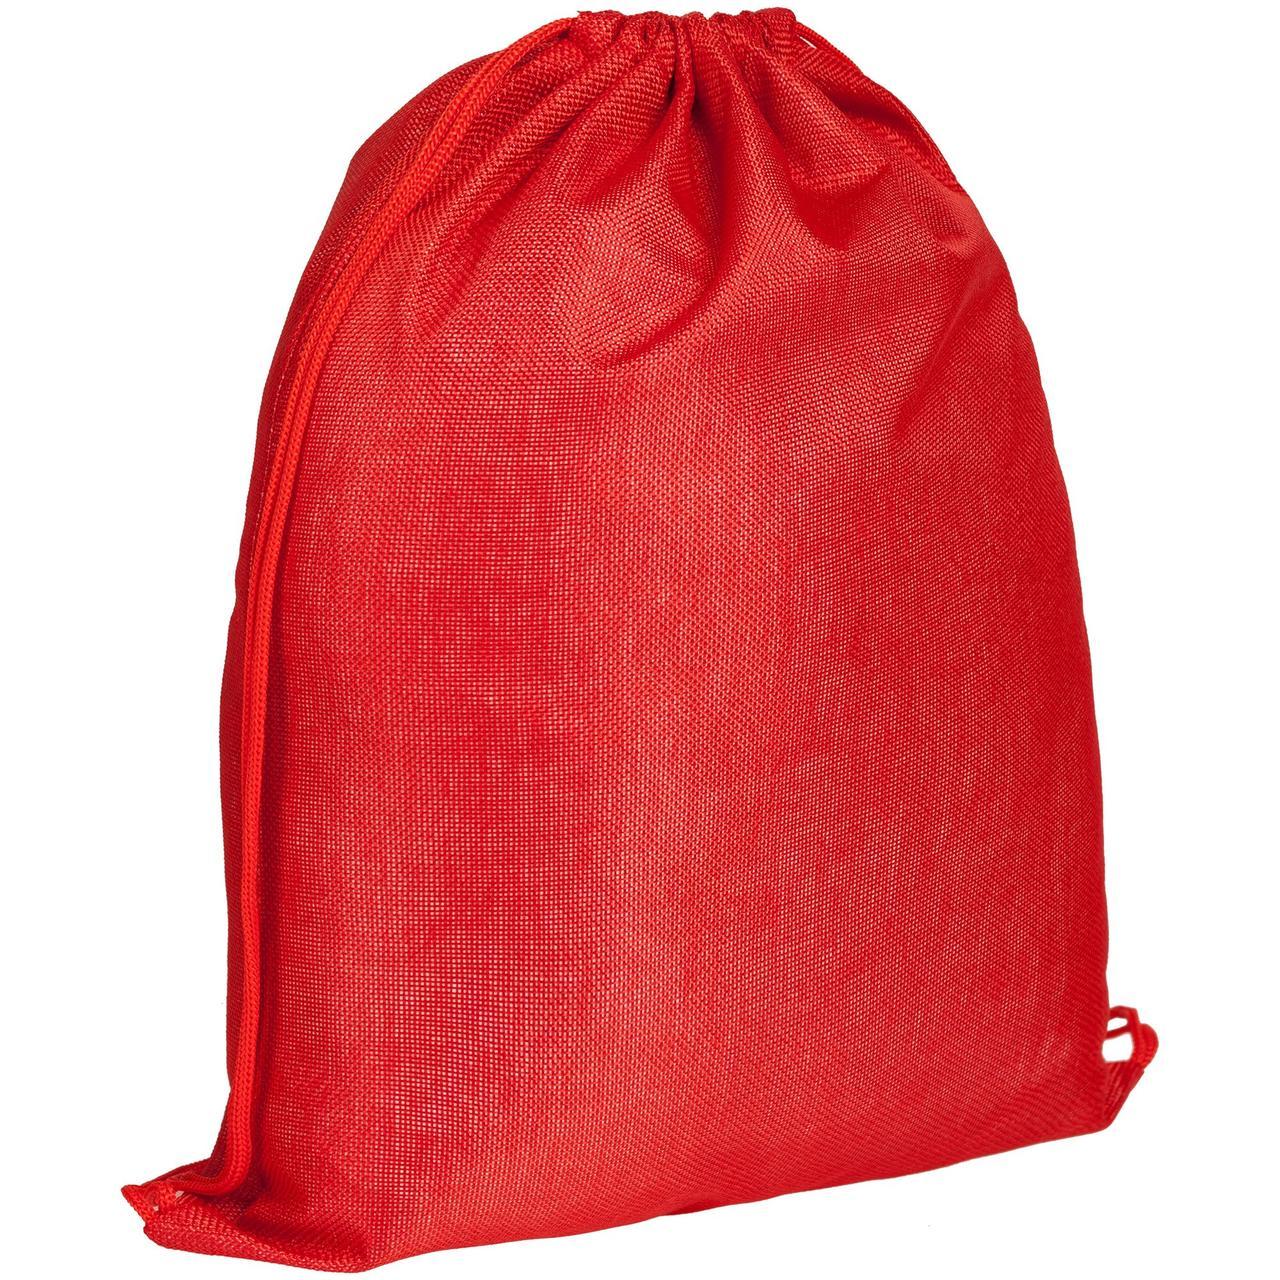 Рюкзак Foster Ramble, красный (артикул 7948.50)